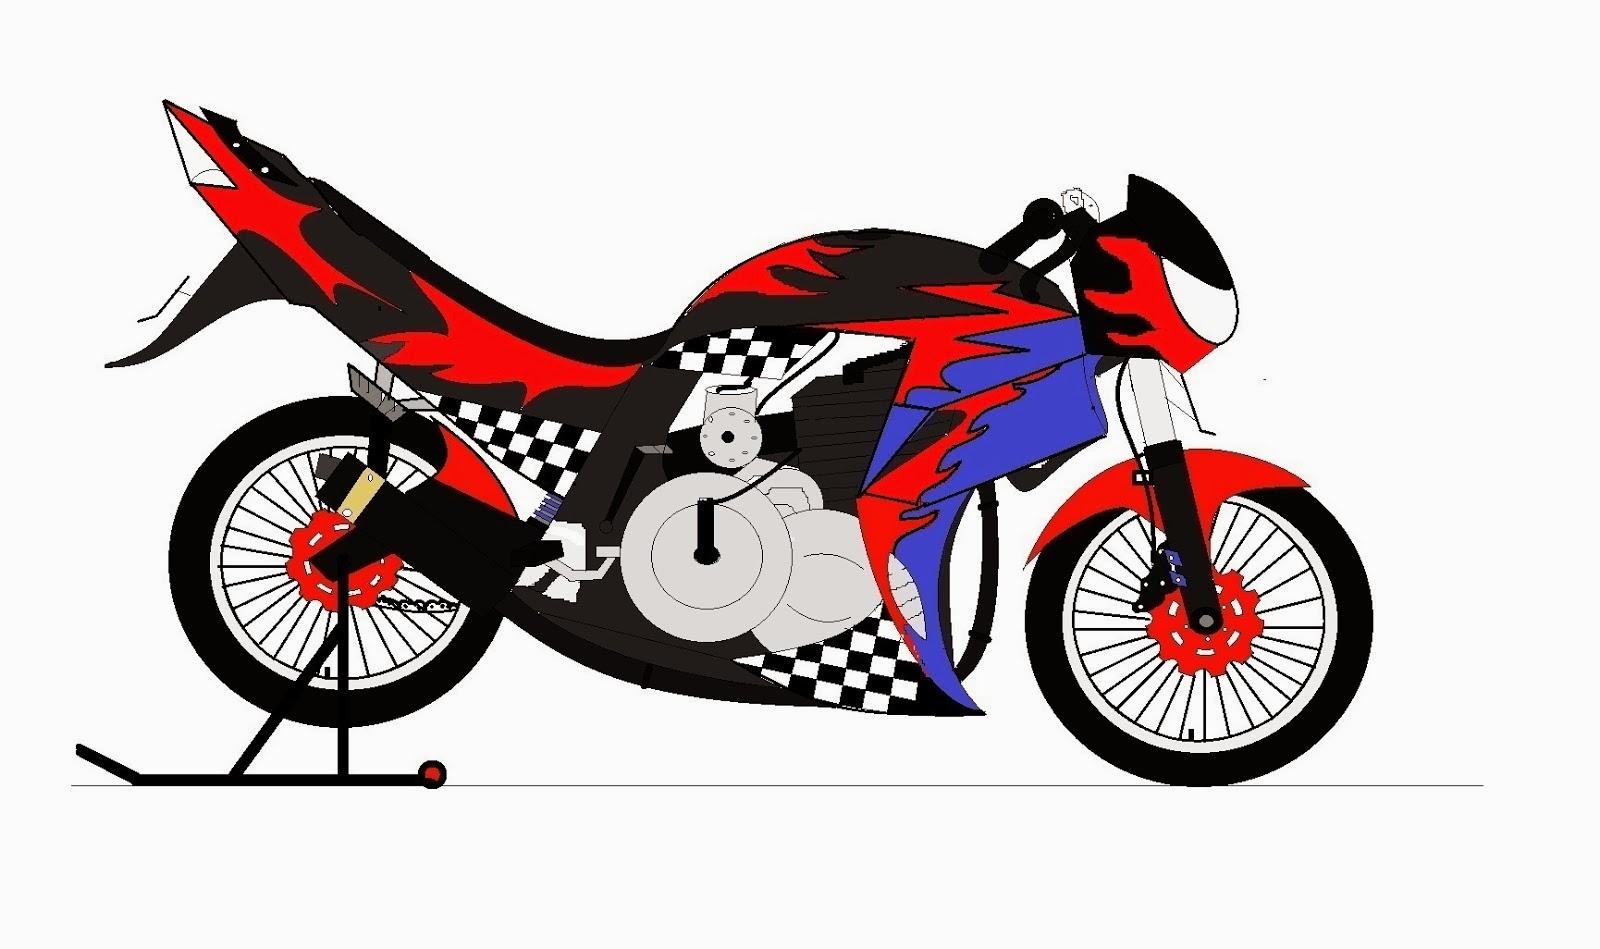 100 Gambar Motor Drag Cartoon Terbaru Dan Terlengkap Kewak Motor